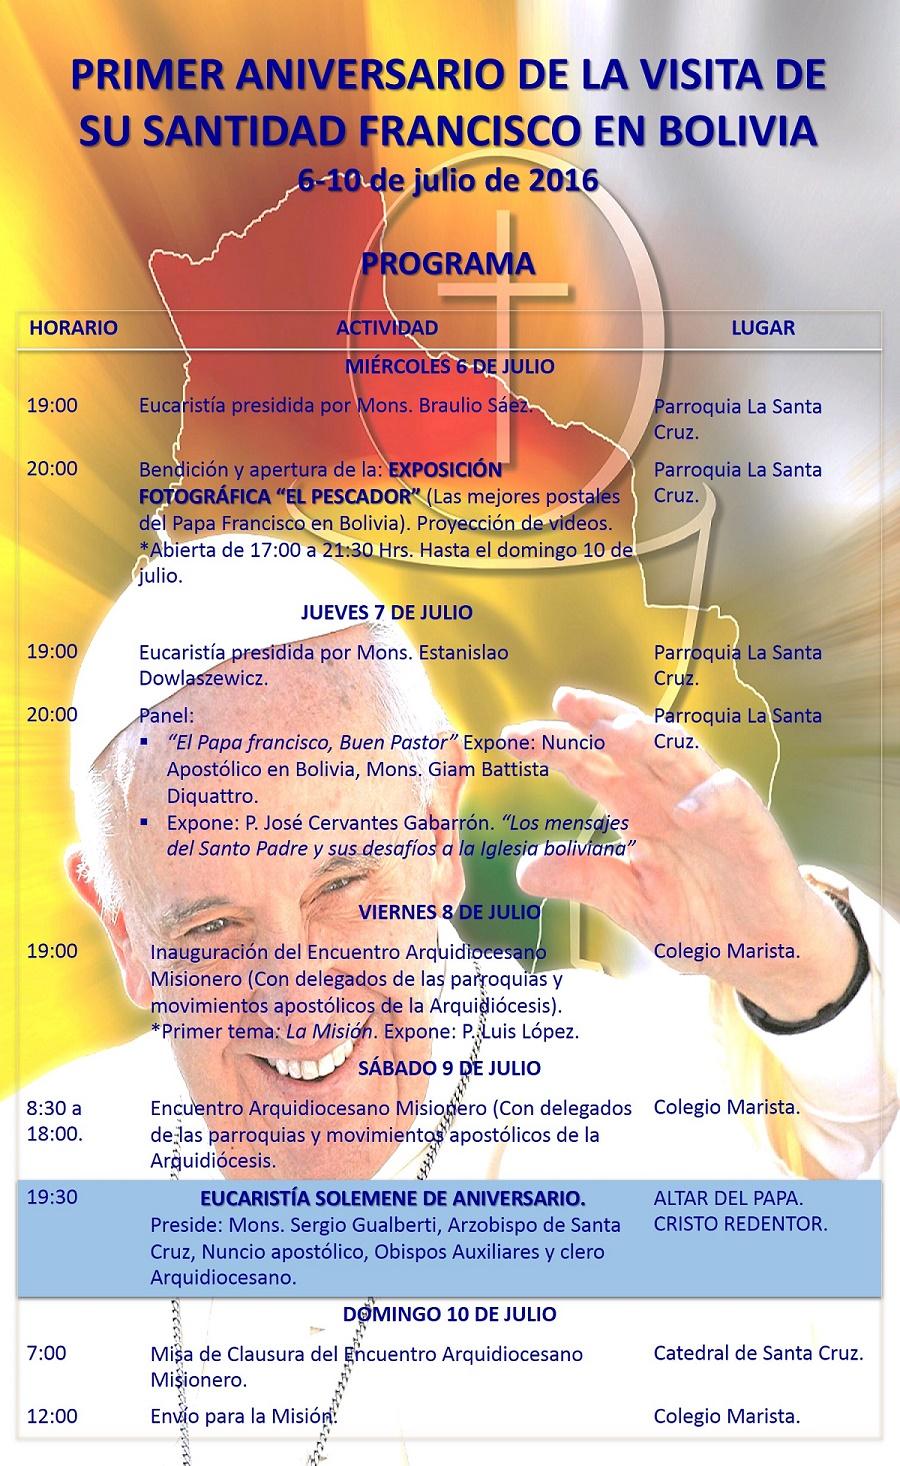 Programa-aniversario-visita-SS-Francisco